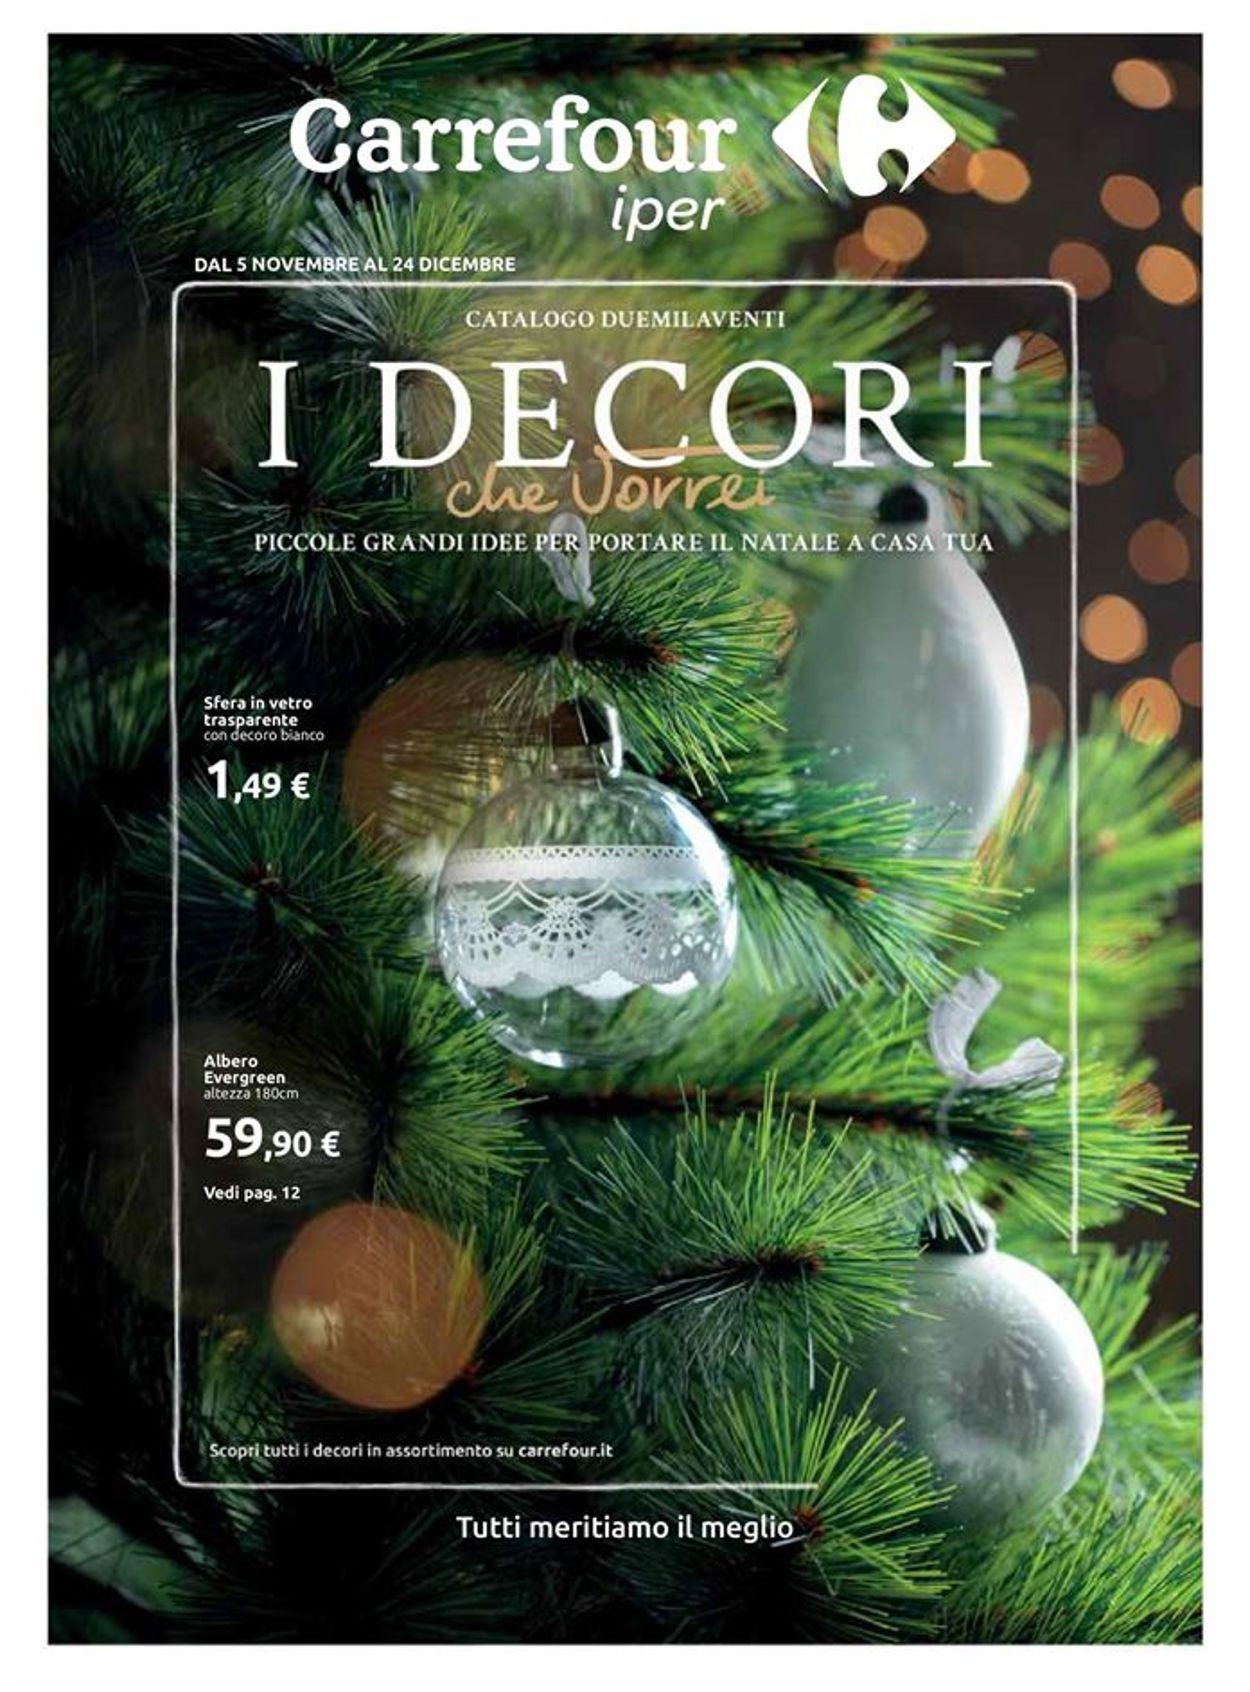 Volantino Carrefour - Natale 2020 - Offerte 09/11-24/12/2020